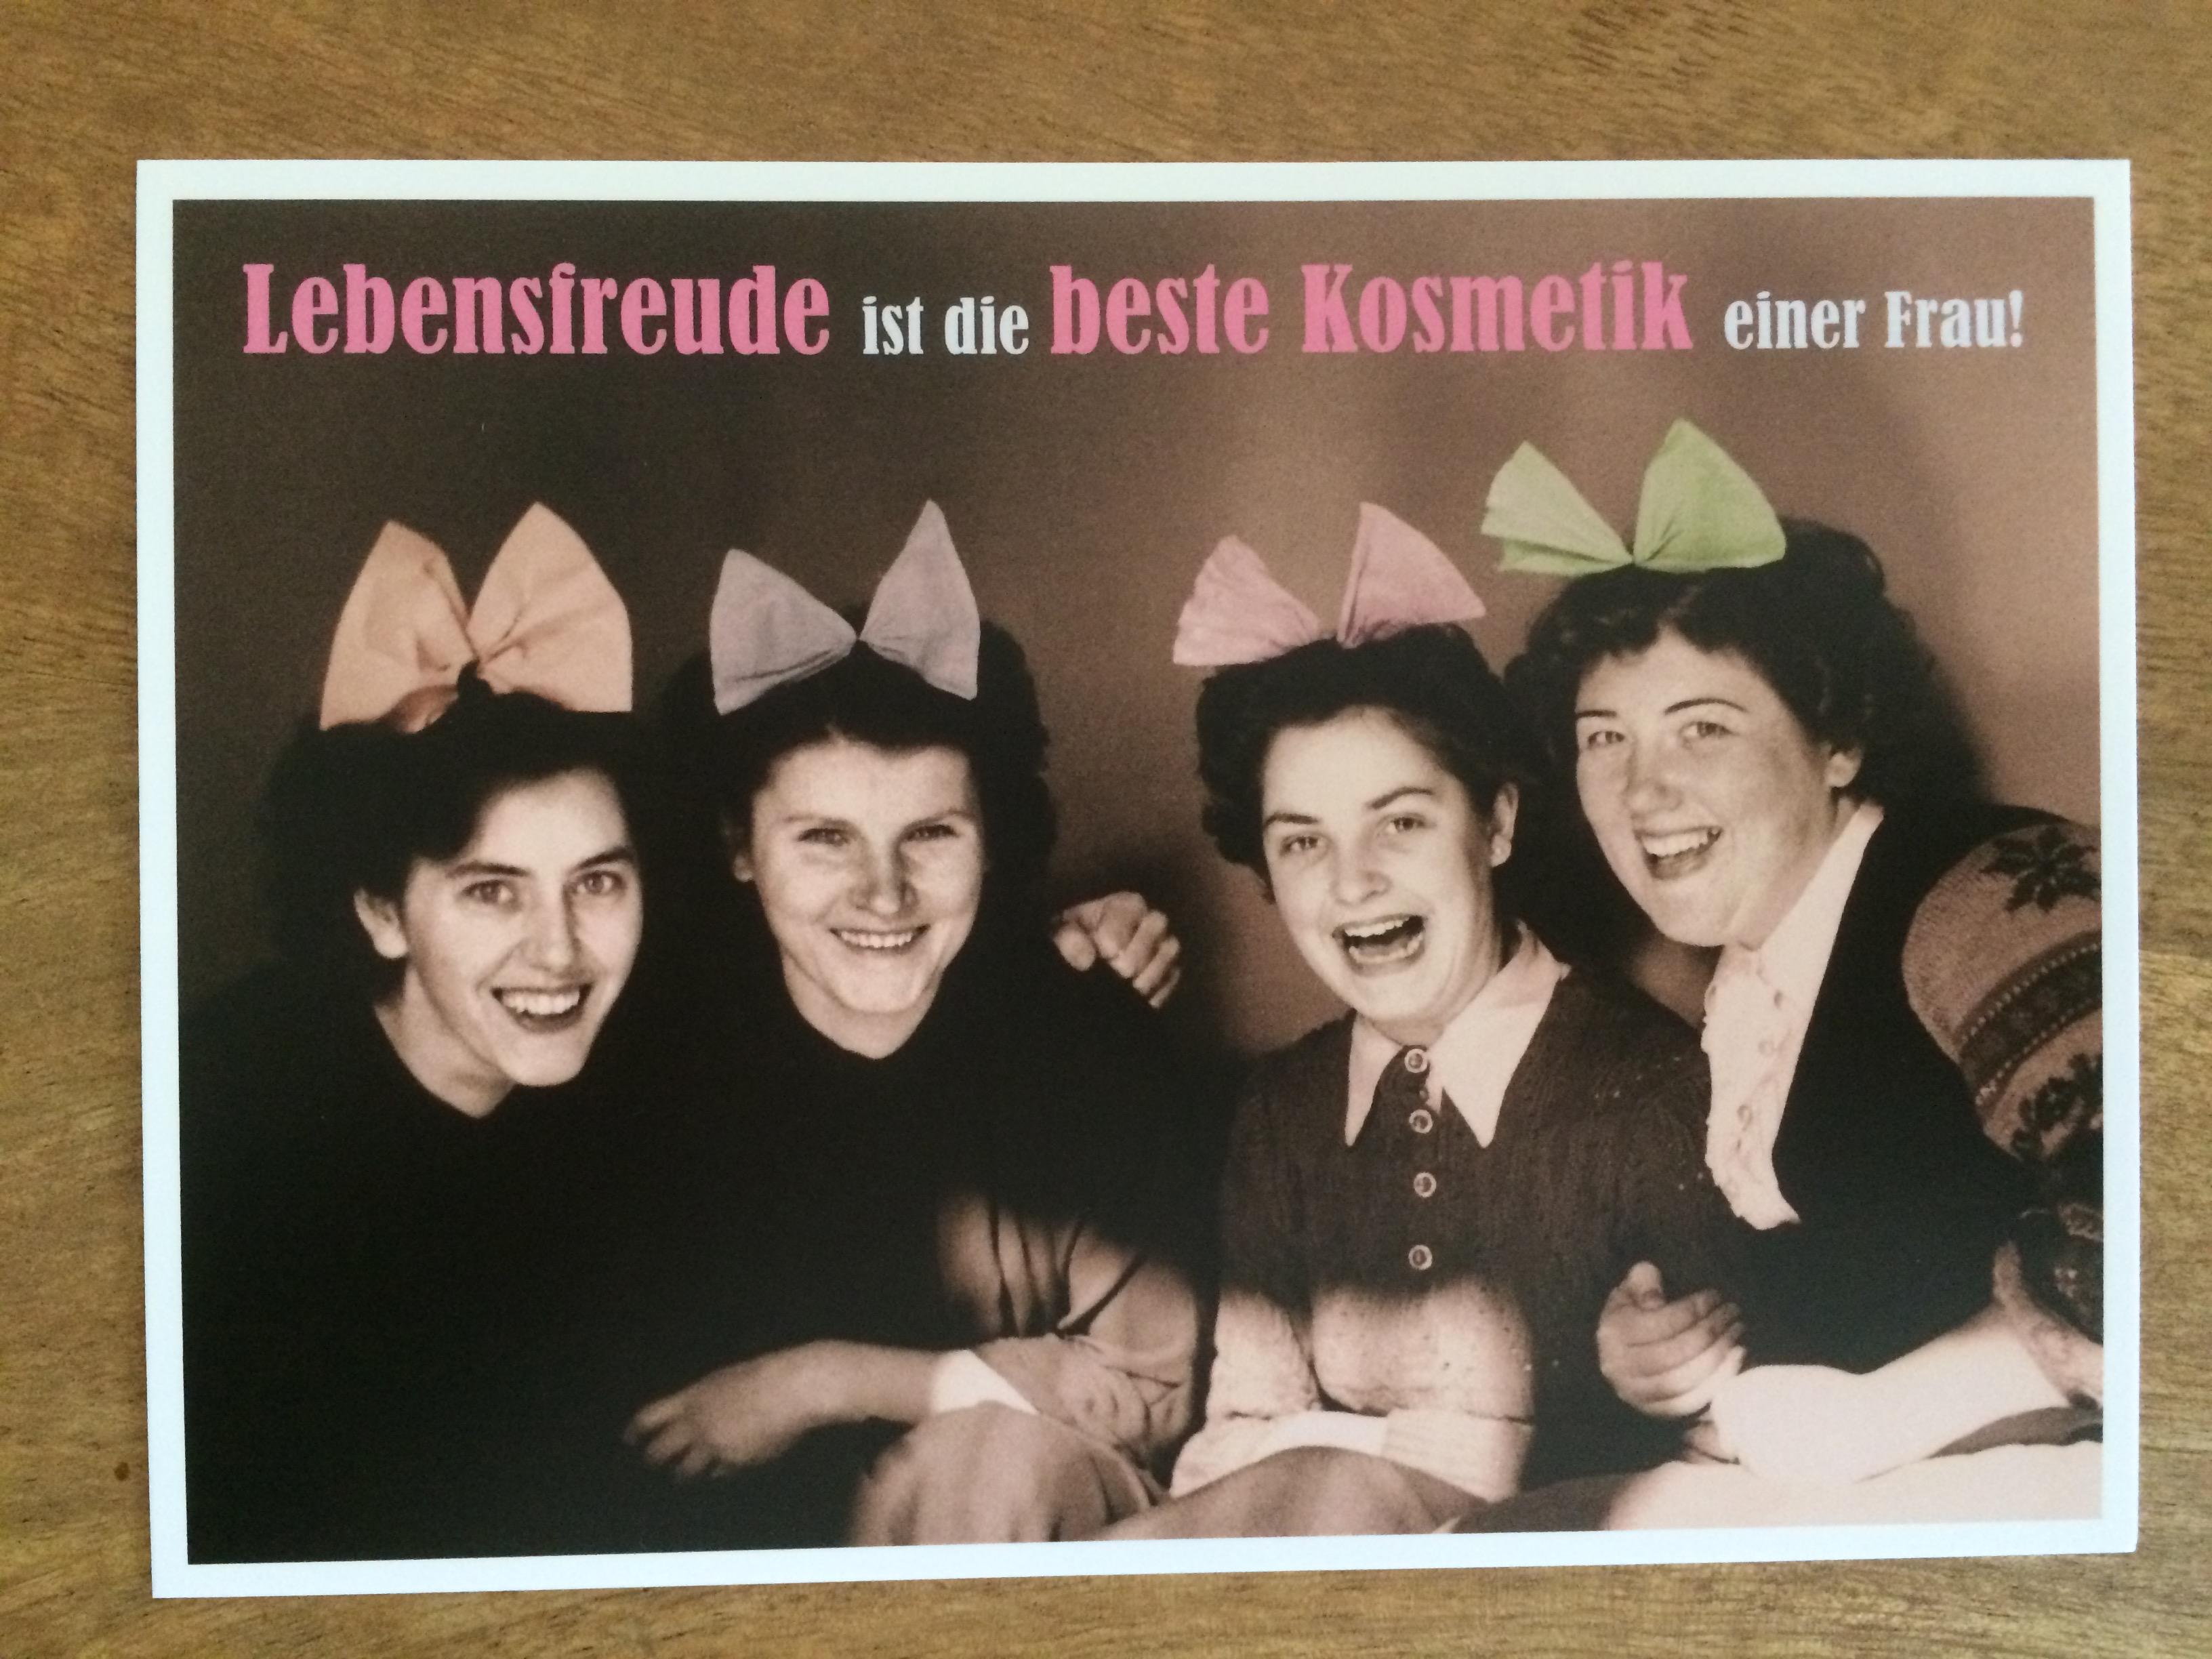 Postkarte Karte Lebensfreude ist die beste Kosmetik einer Frau Paloma